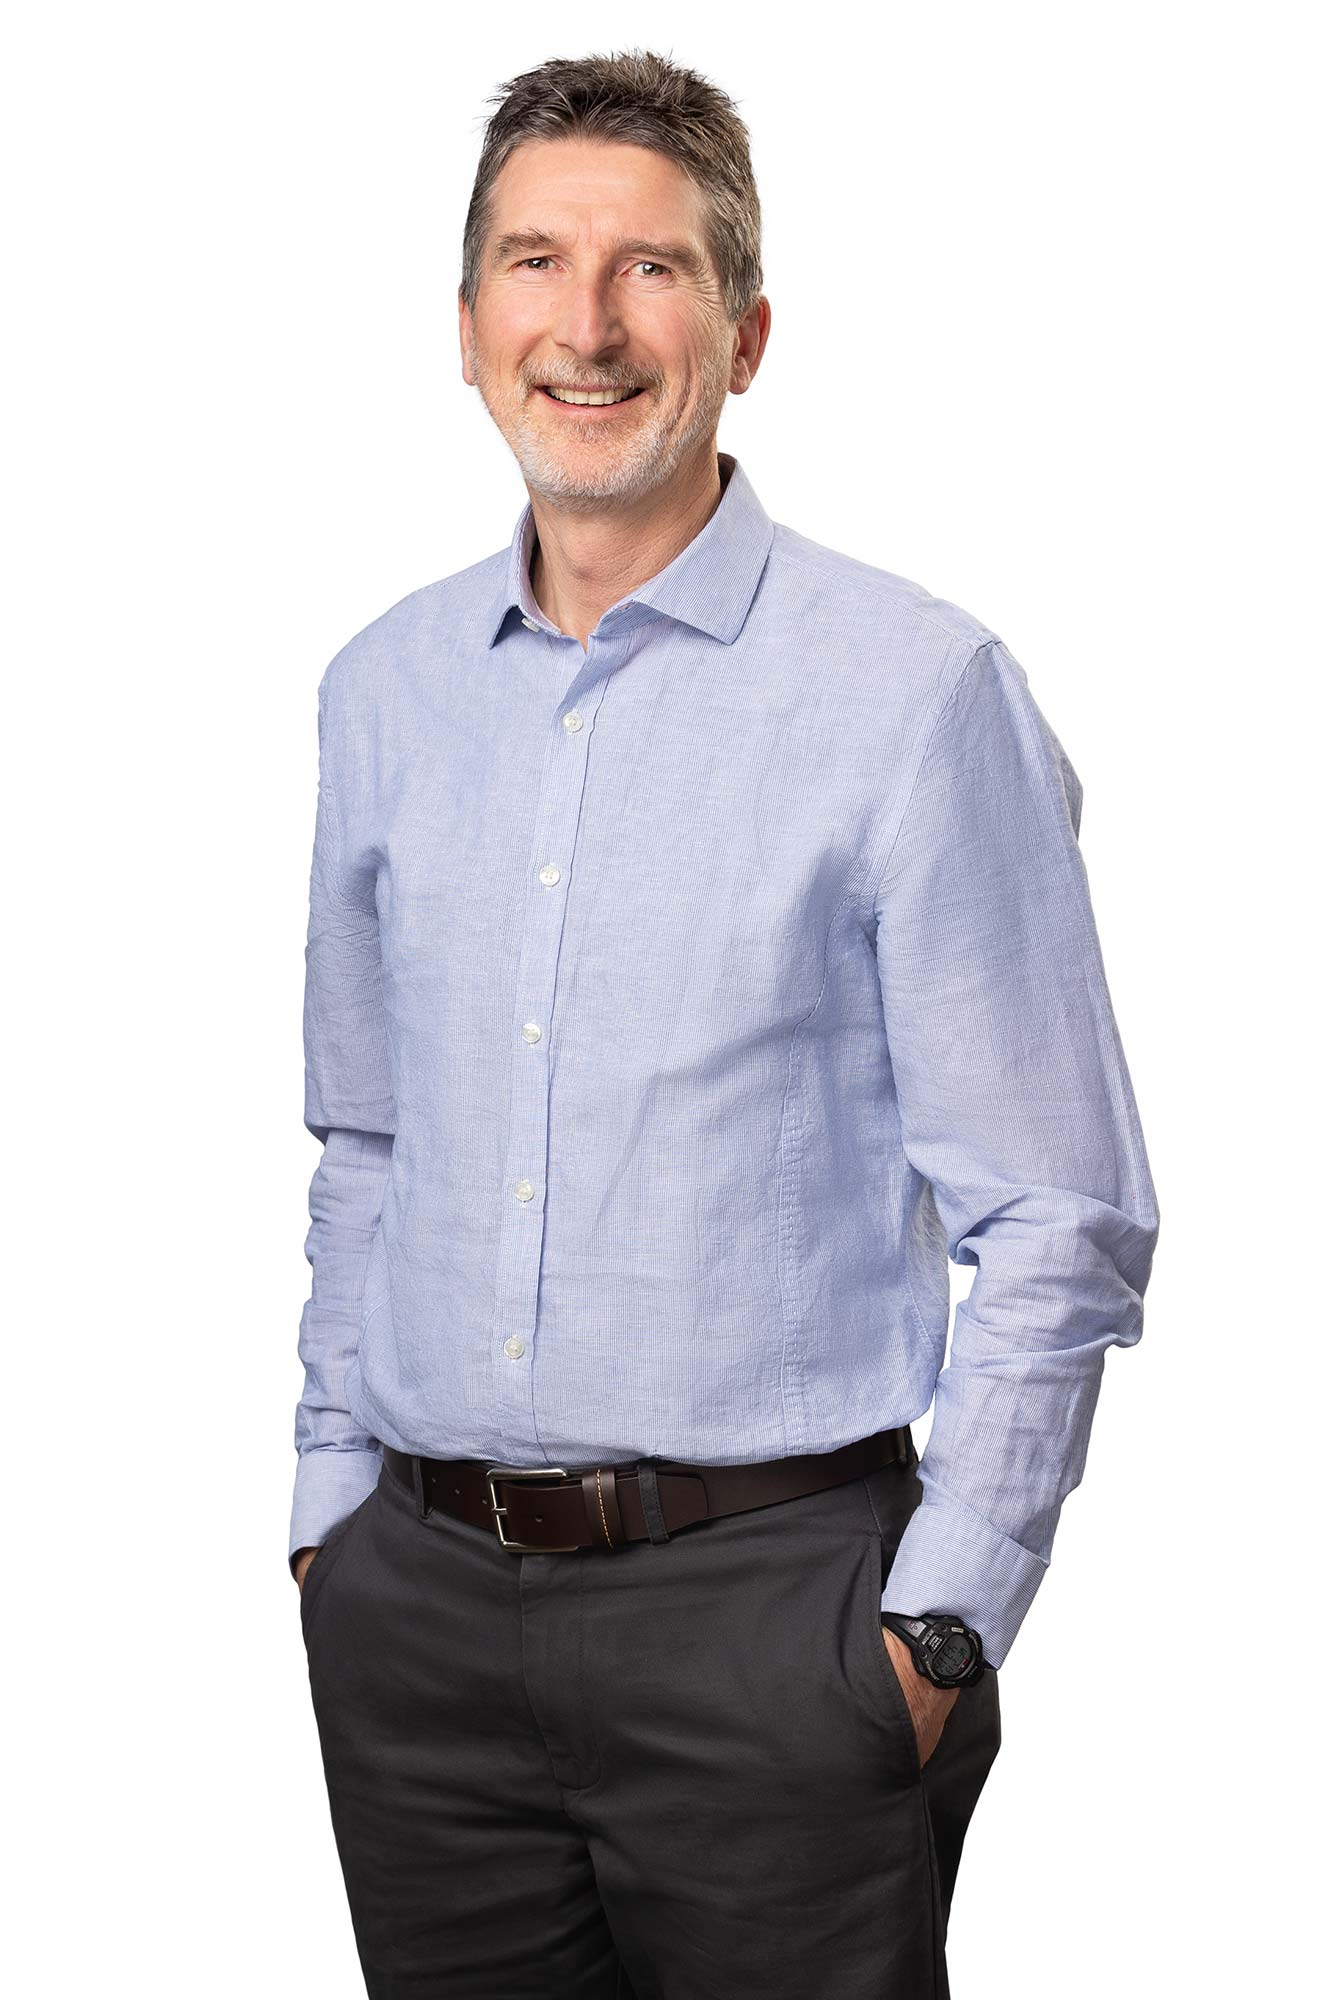 Jim Graham PE Project Manager Cincinnati Office Schaefer